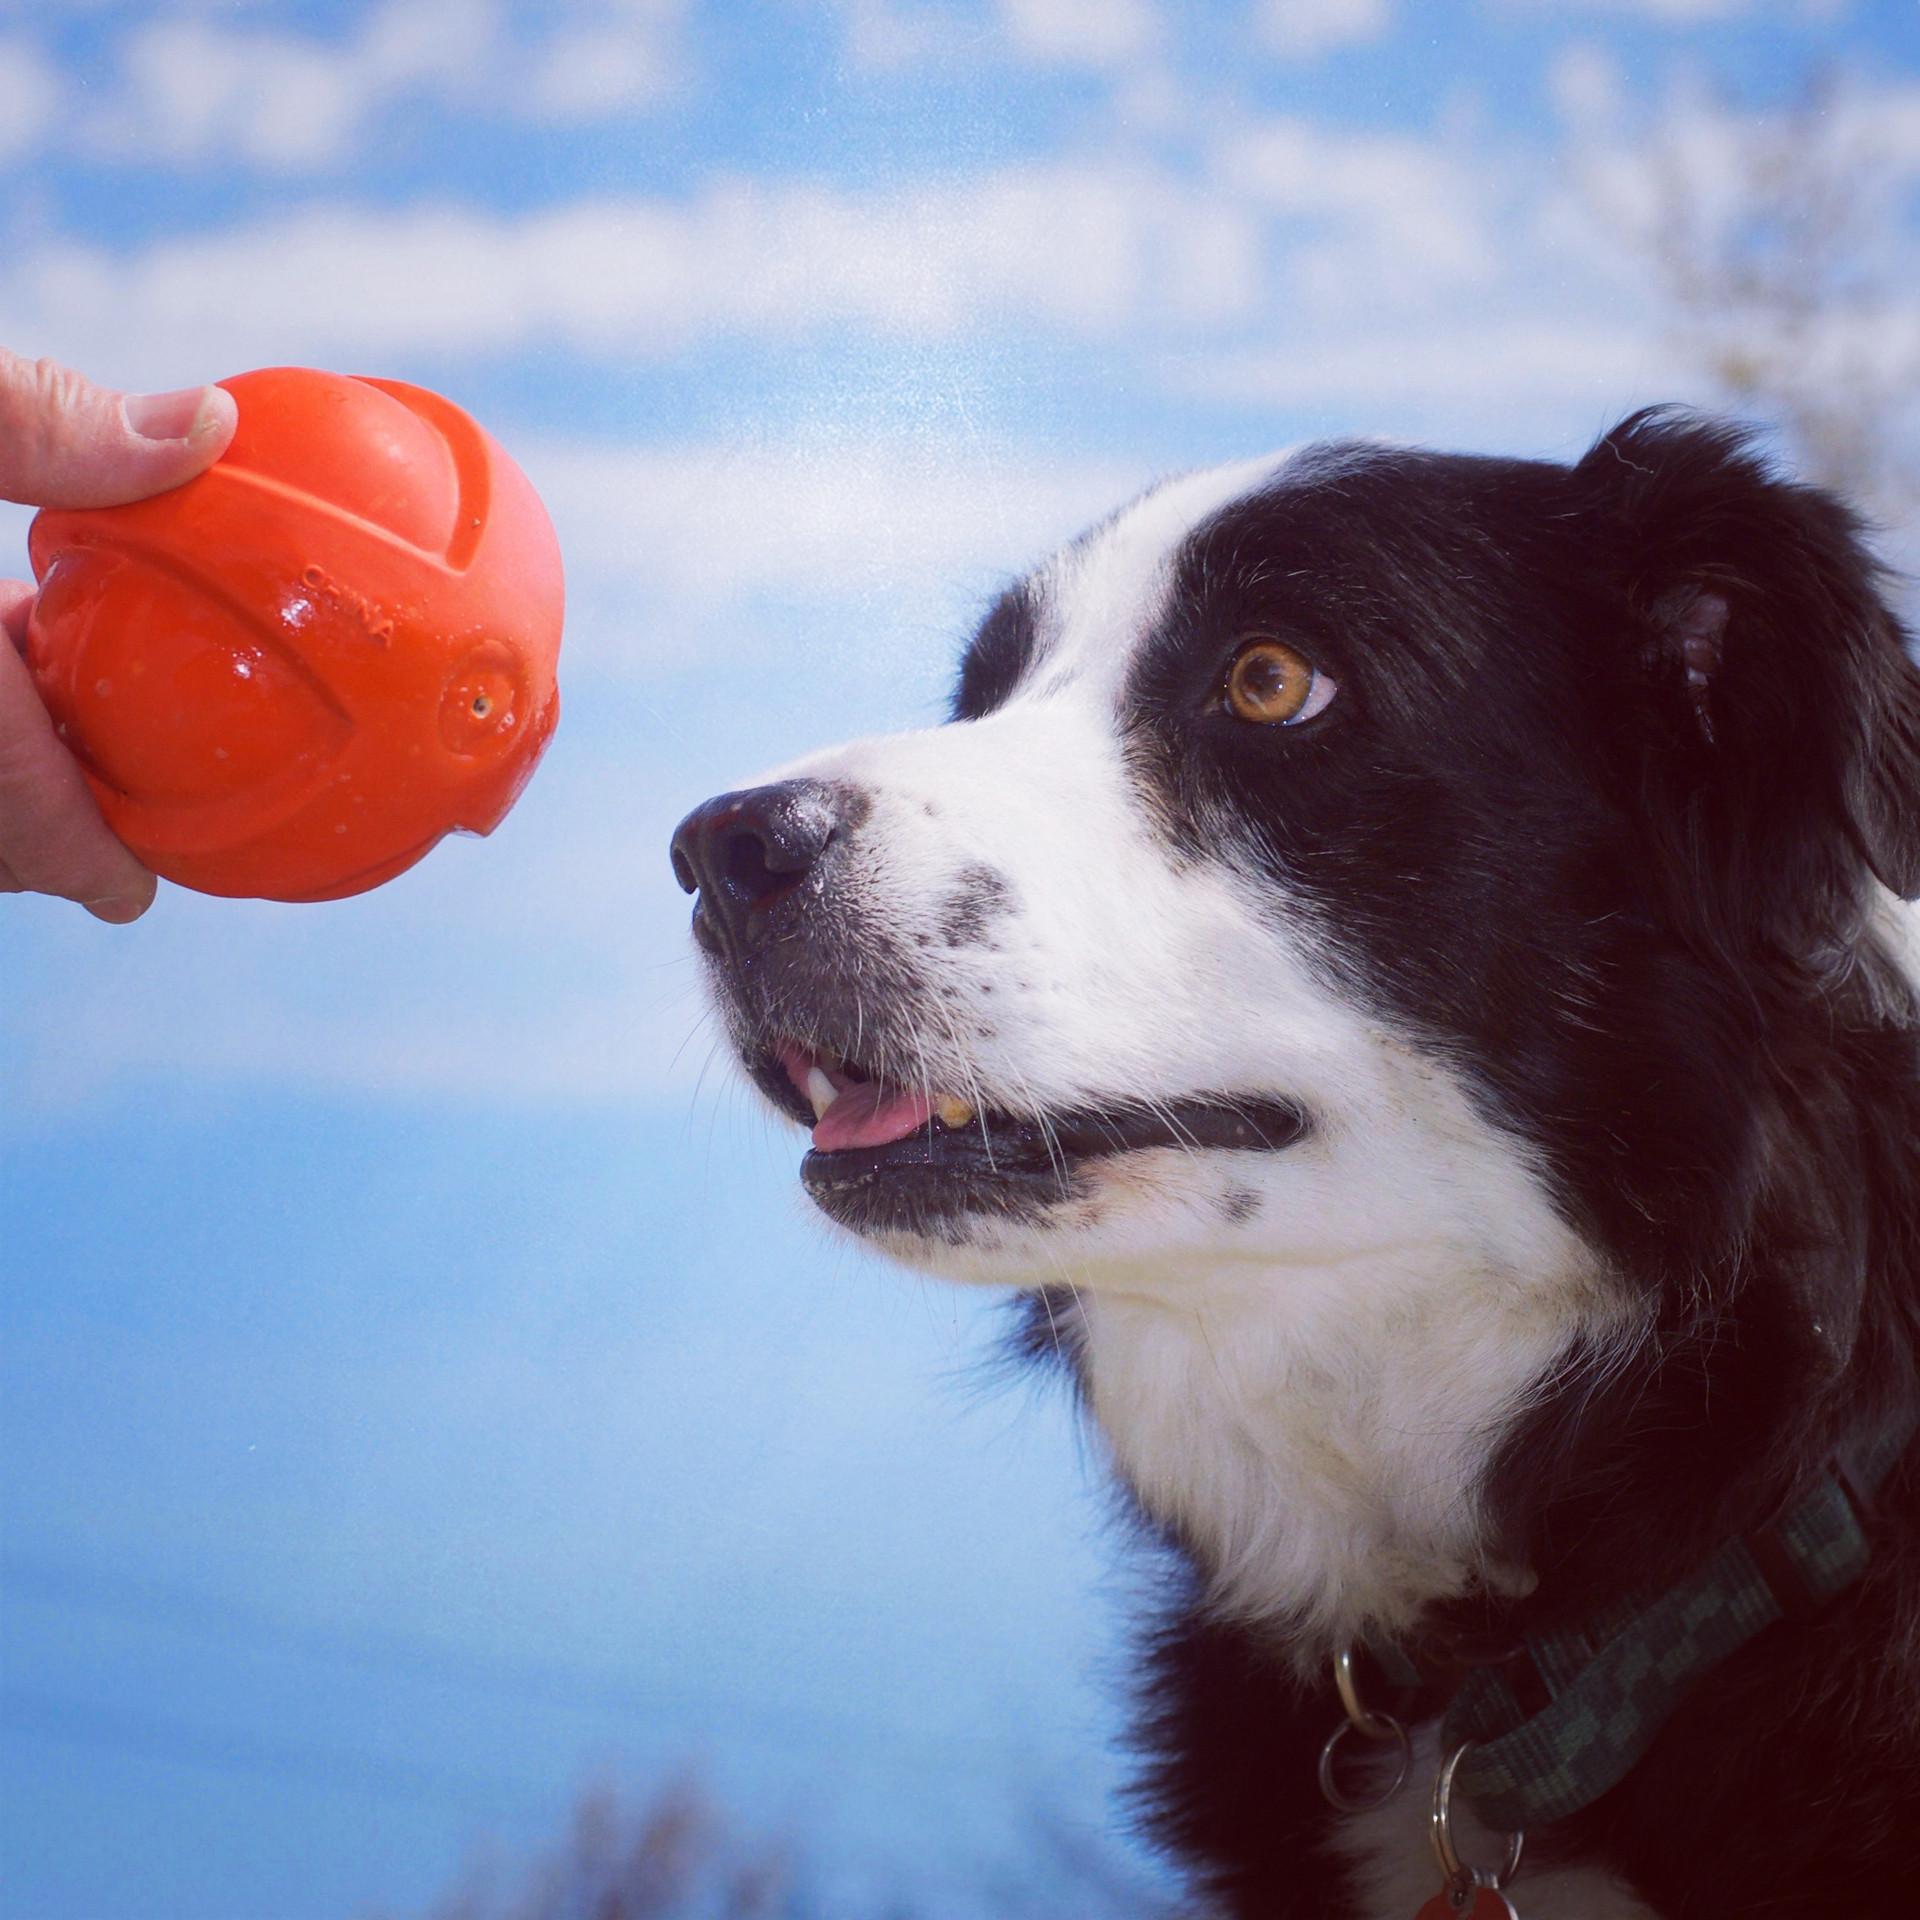 The ball, the ball, the ball